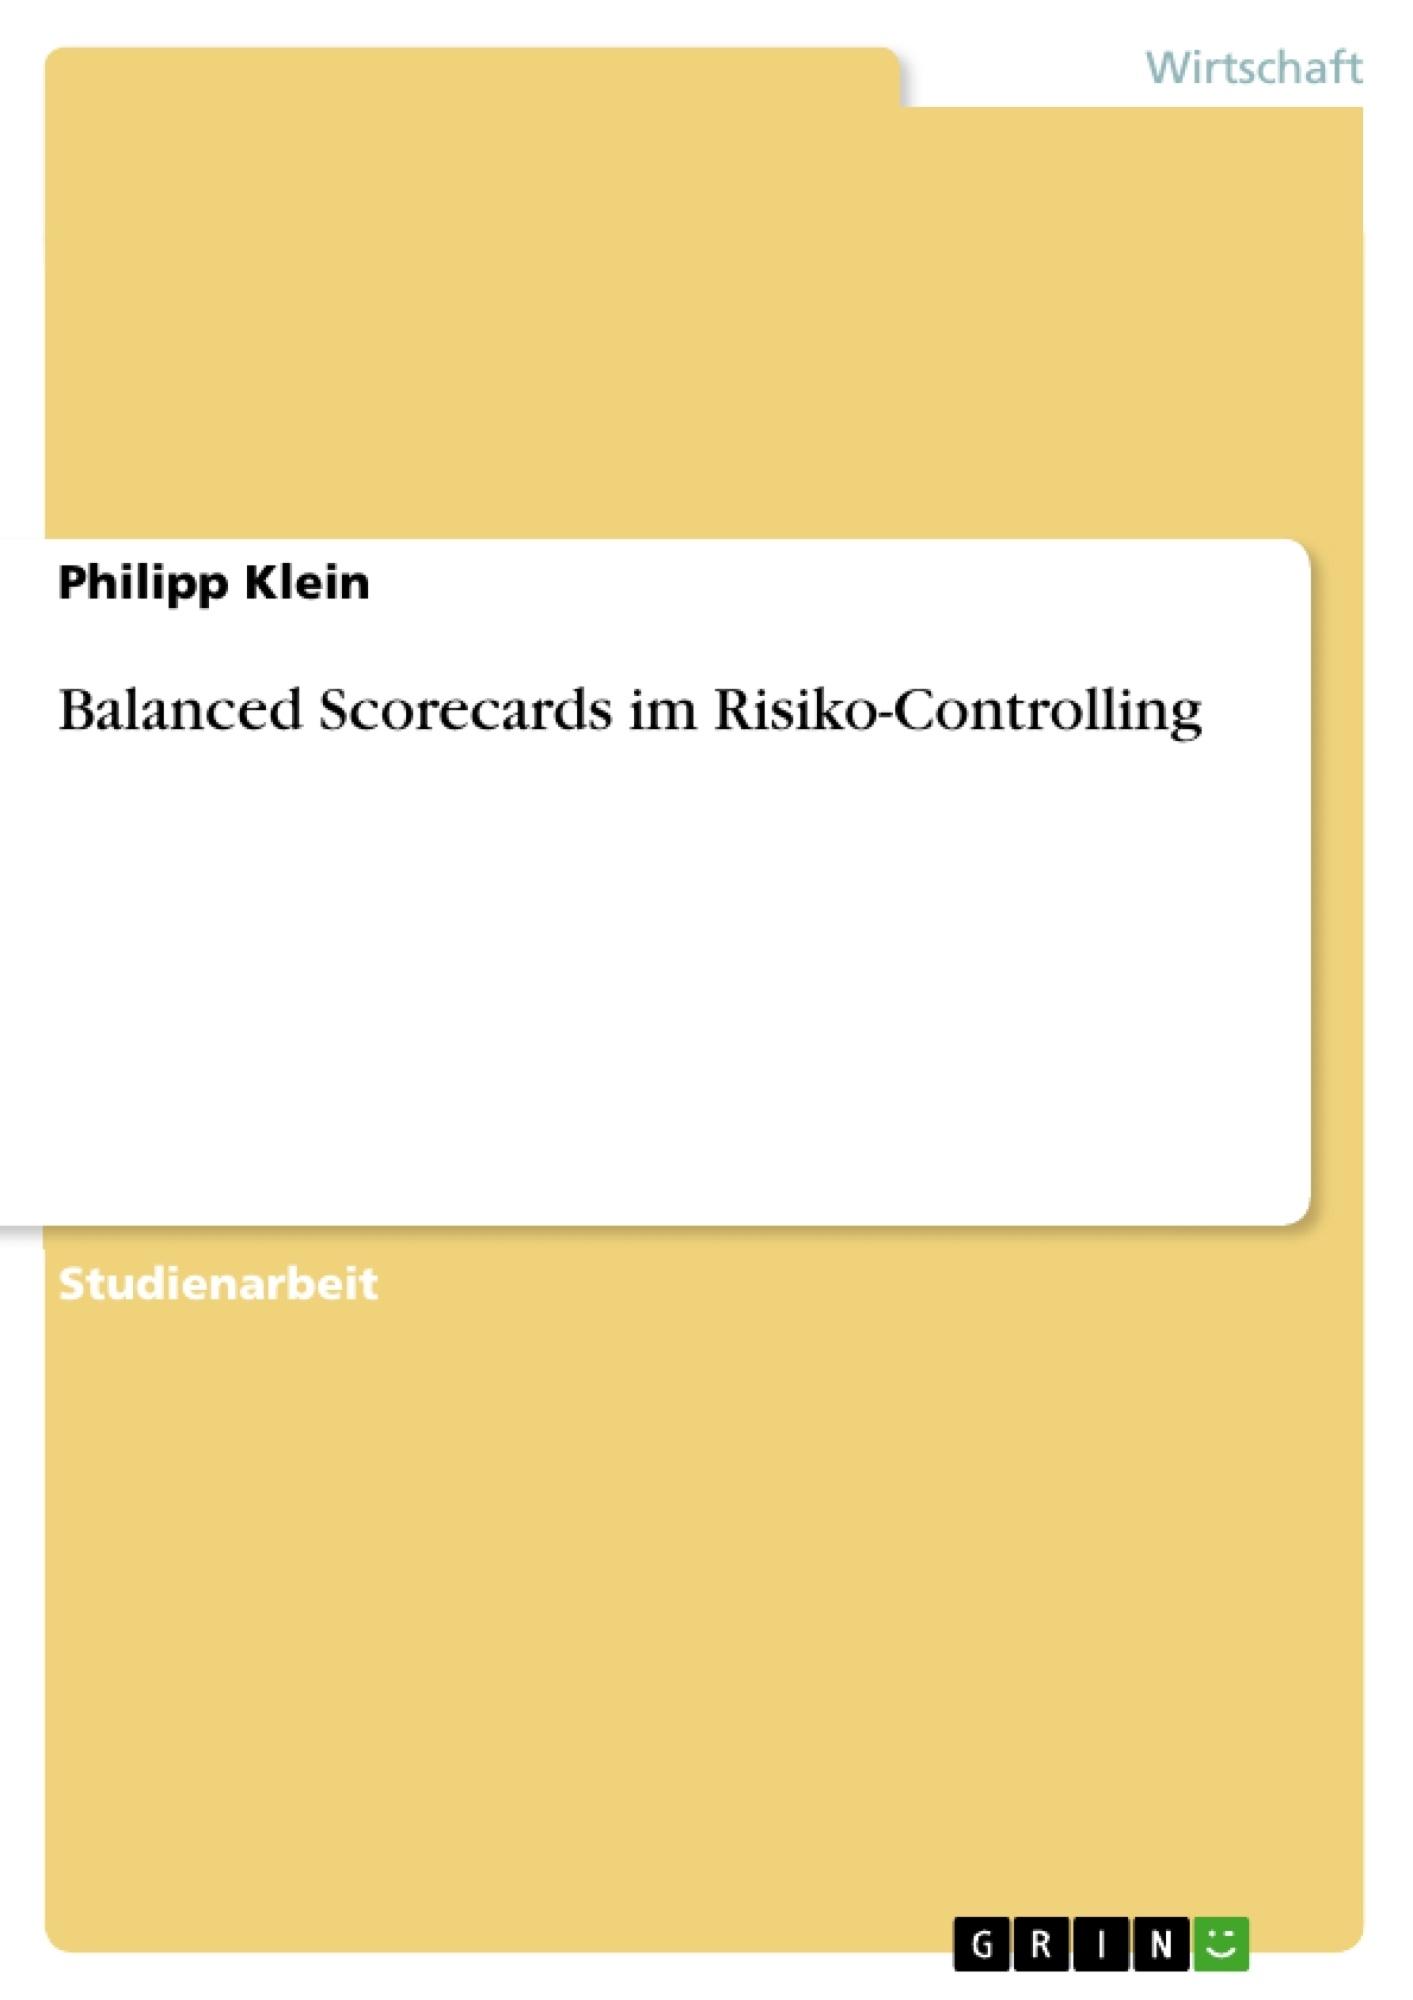 Titel: Balanced Scorecards im Risiko-Controlling